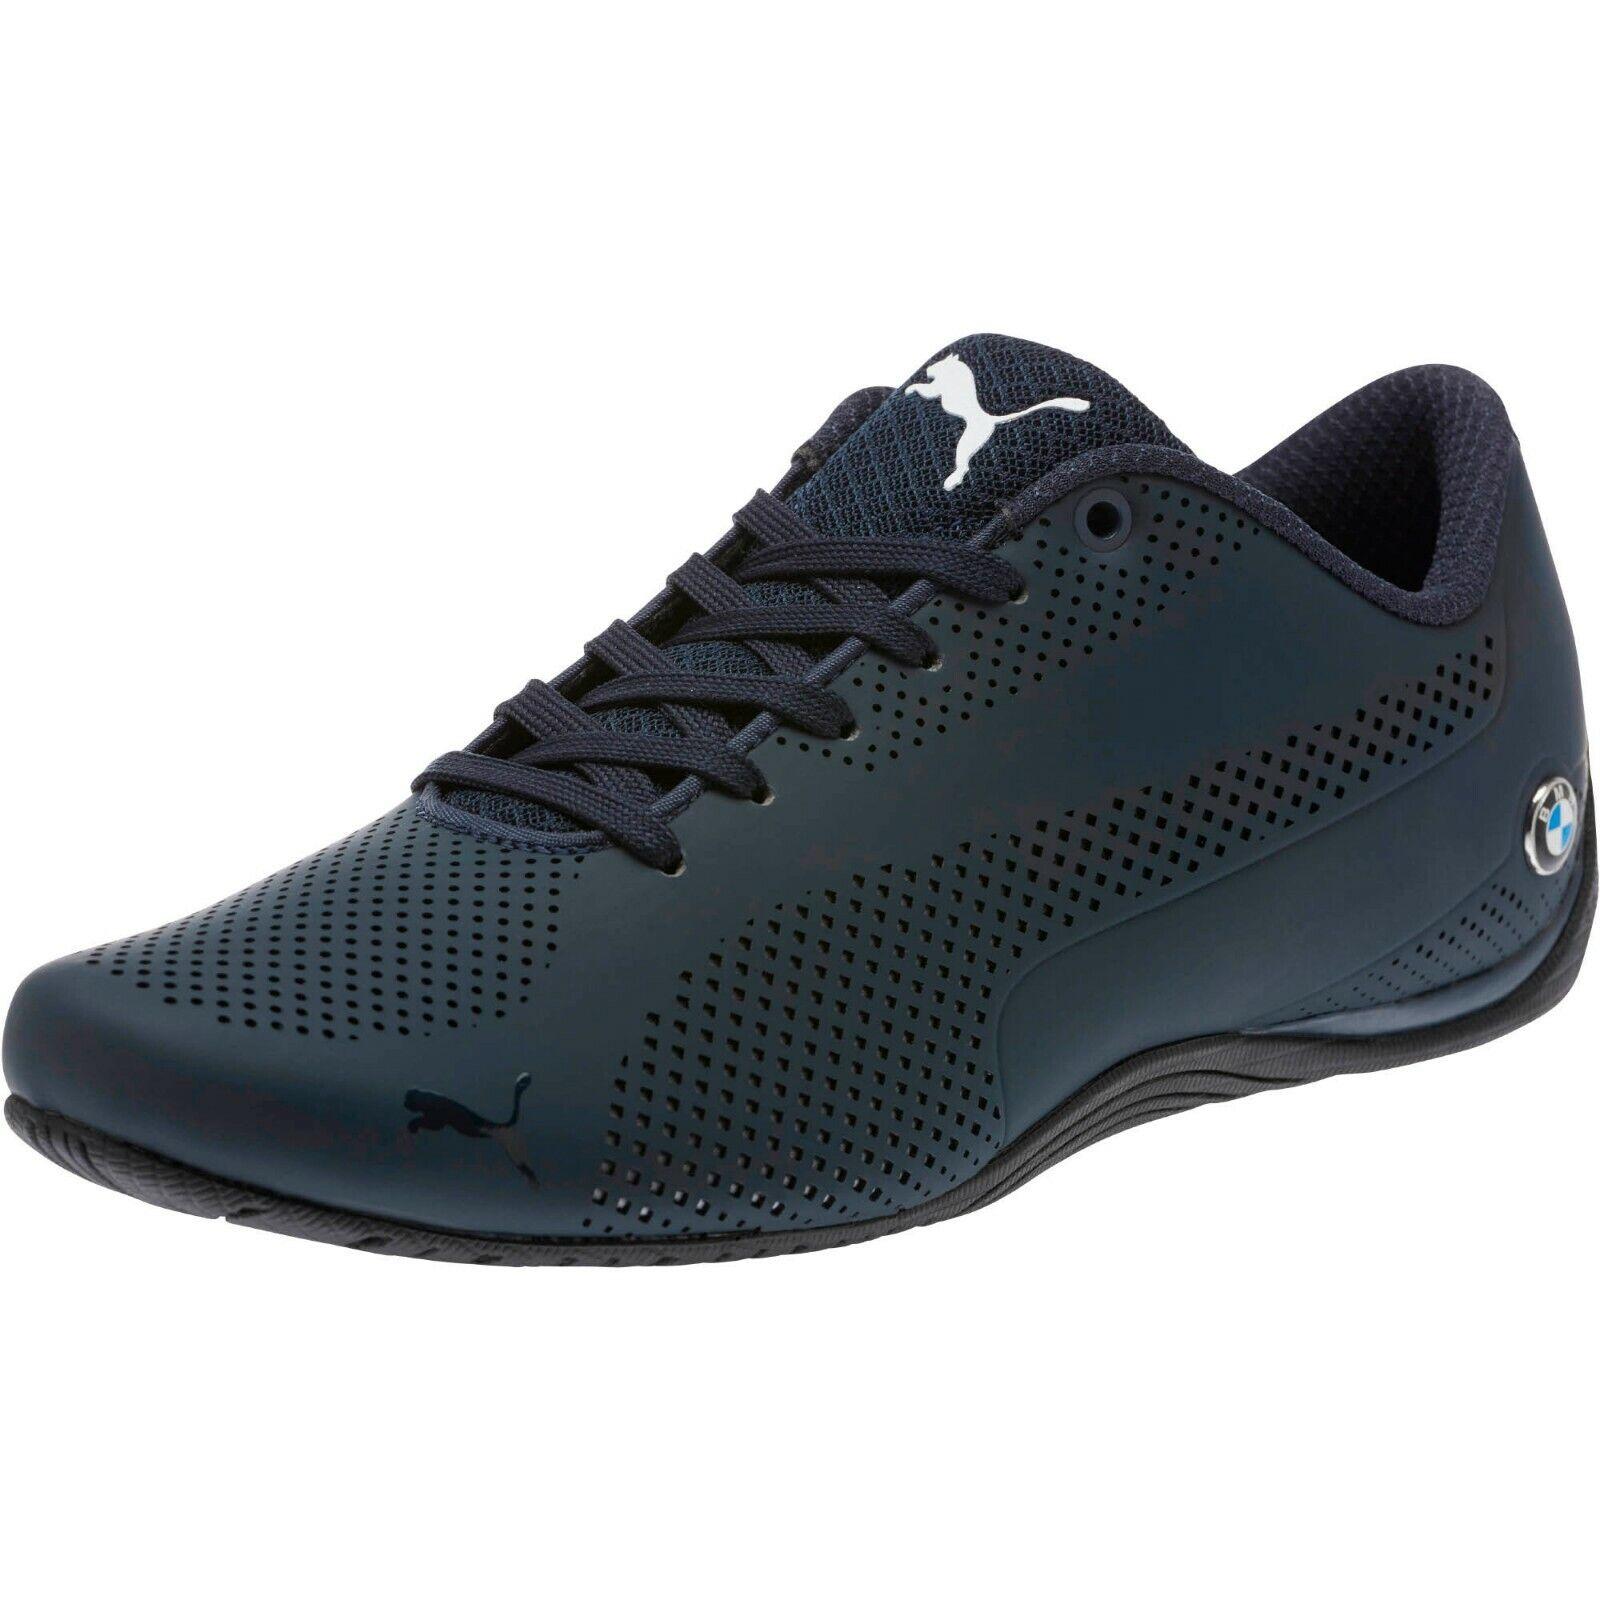 New mens Puma Bmw Drift Cat 5 Ultra Motorsport Shoes Blue White Red 305882  01